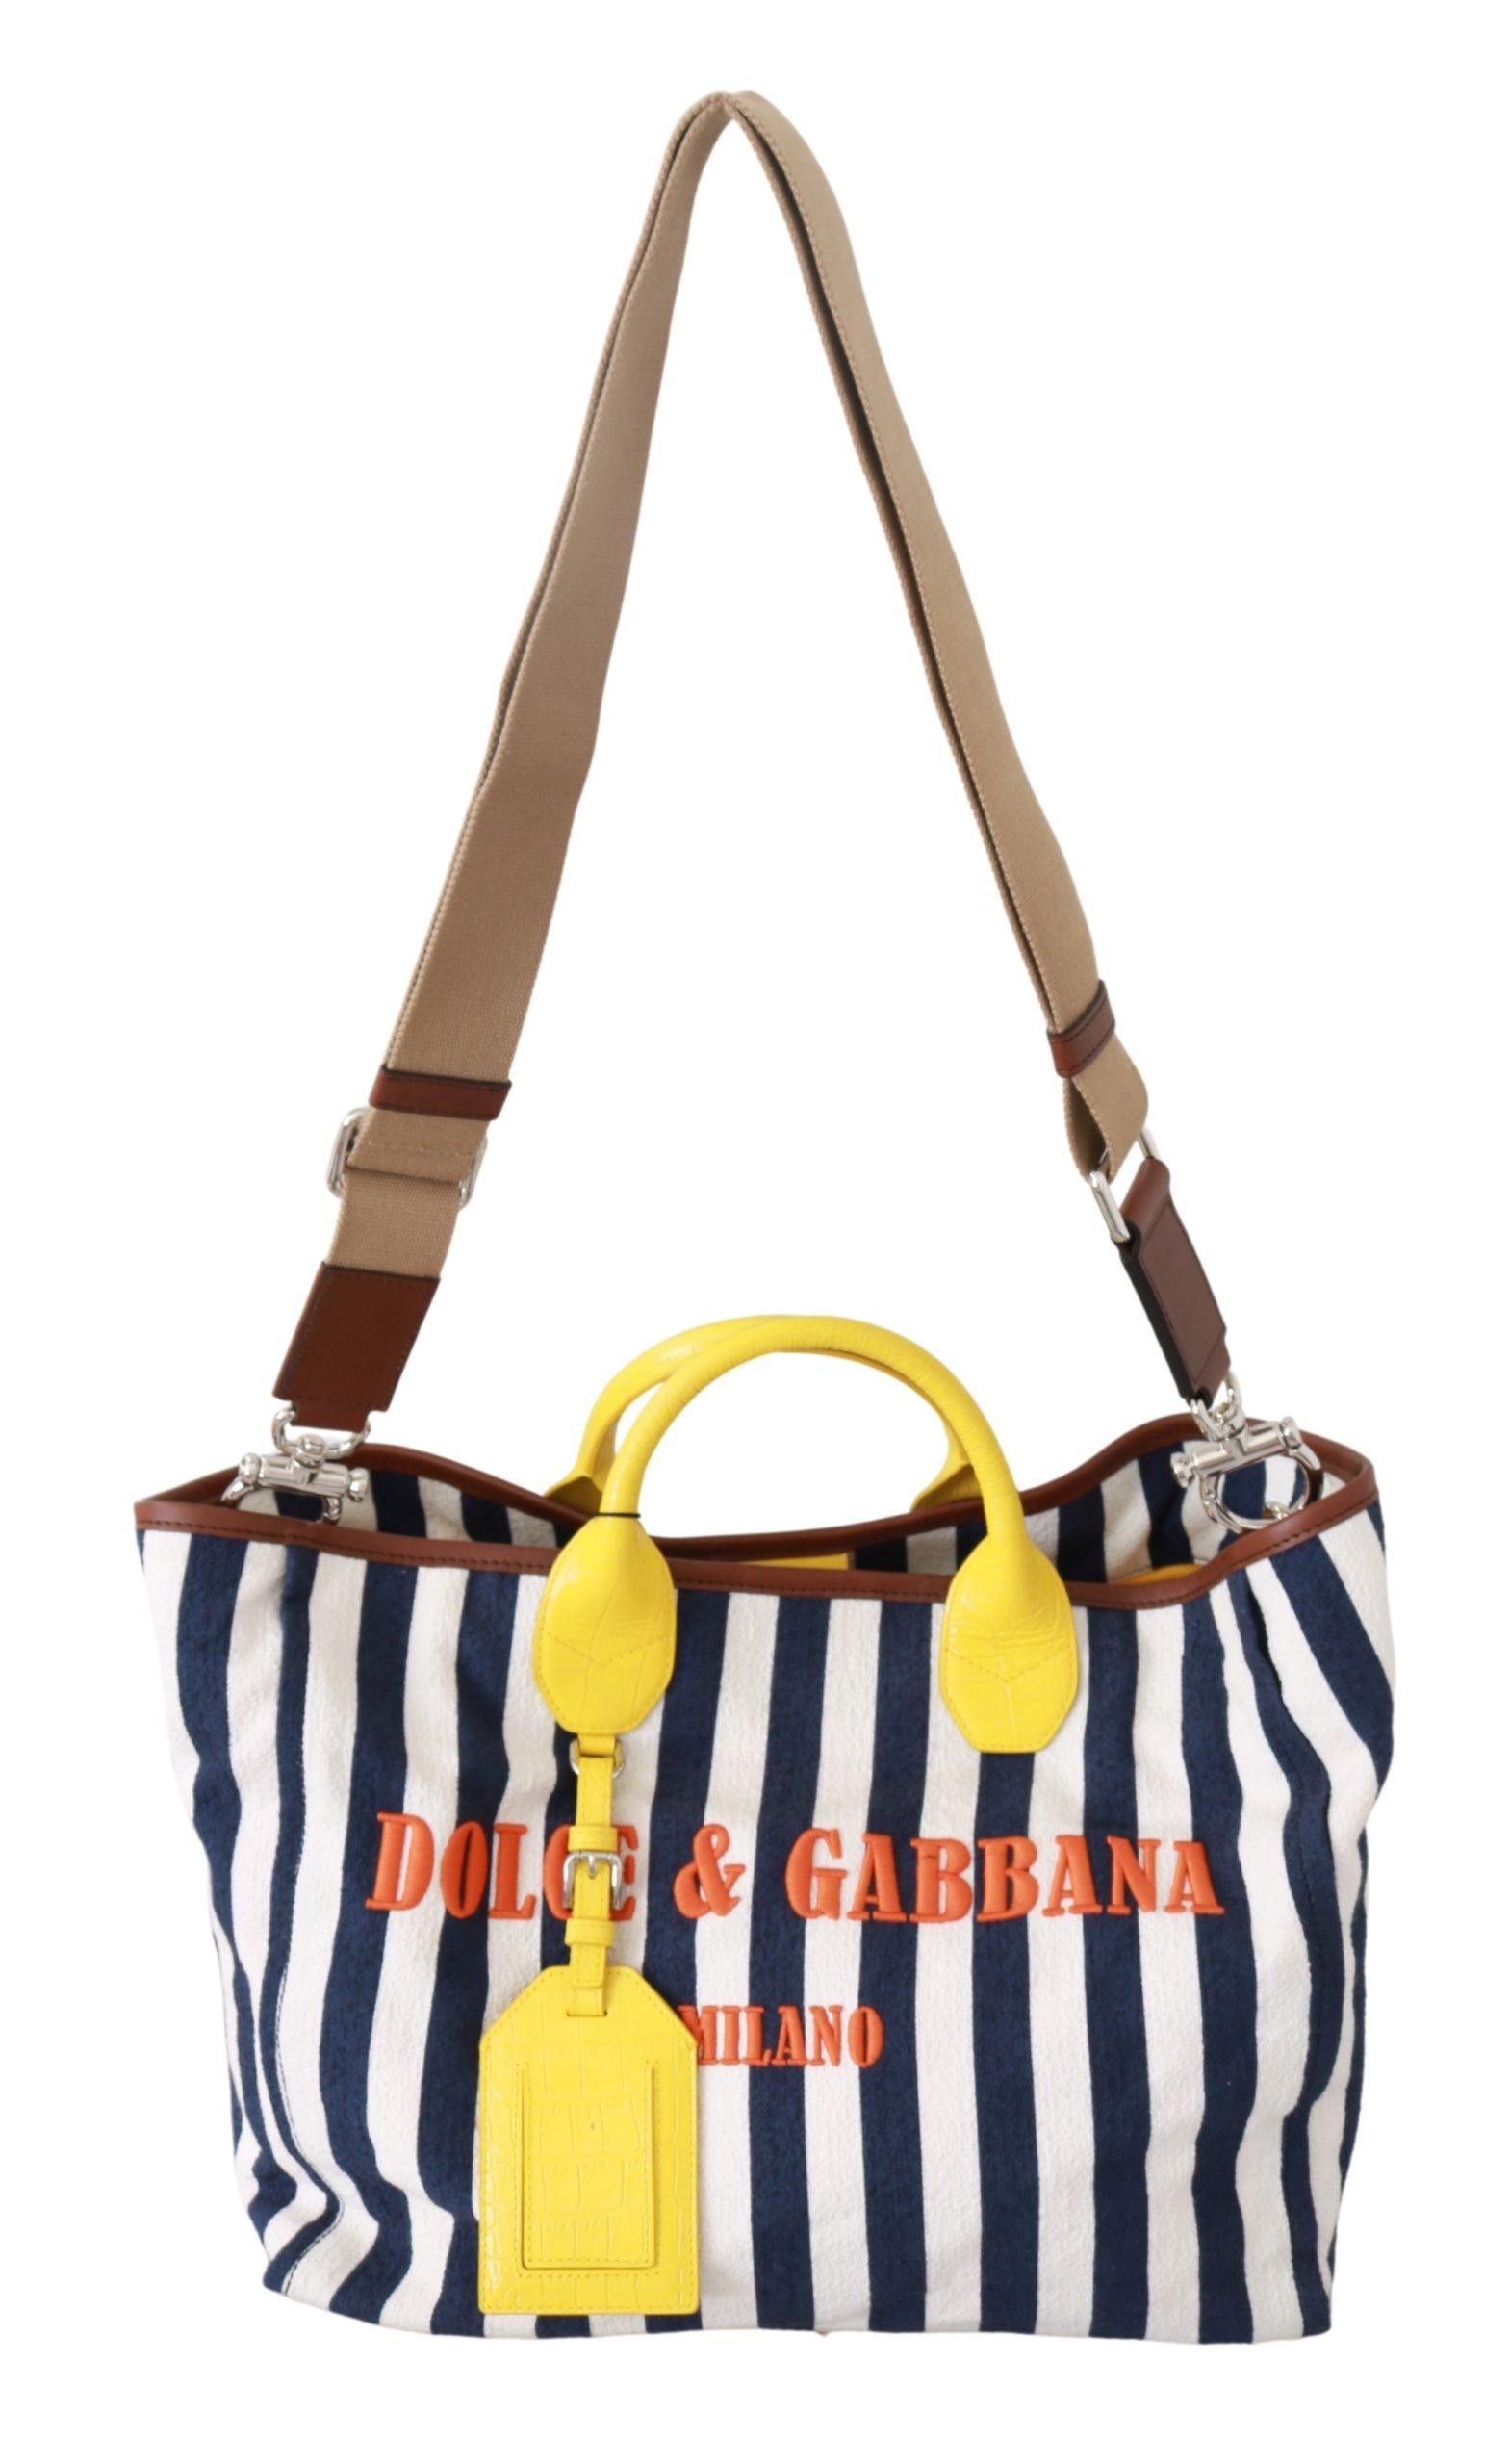 Dolce & Gabbana Women's Striped Shopping Tote Bag Multicolor VAS9253